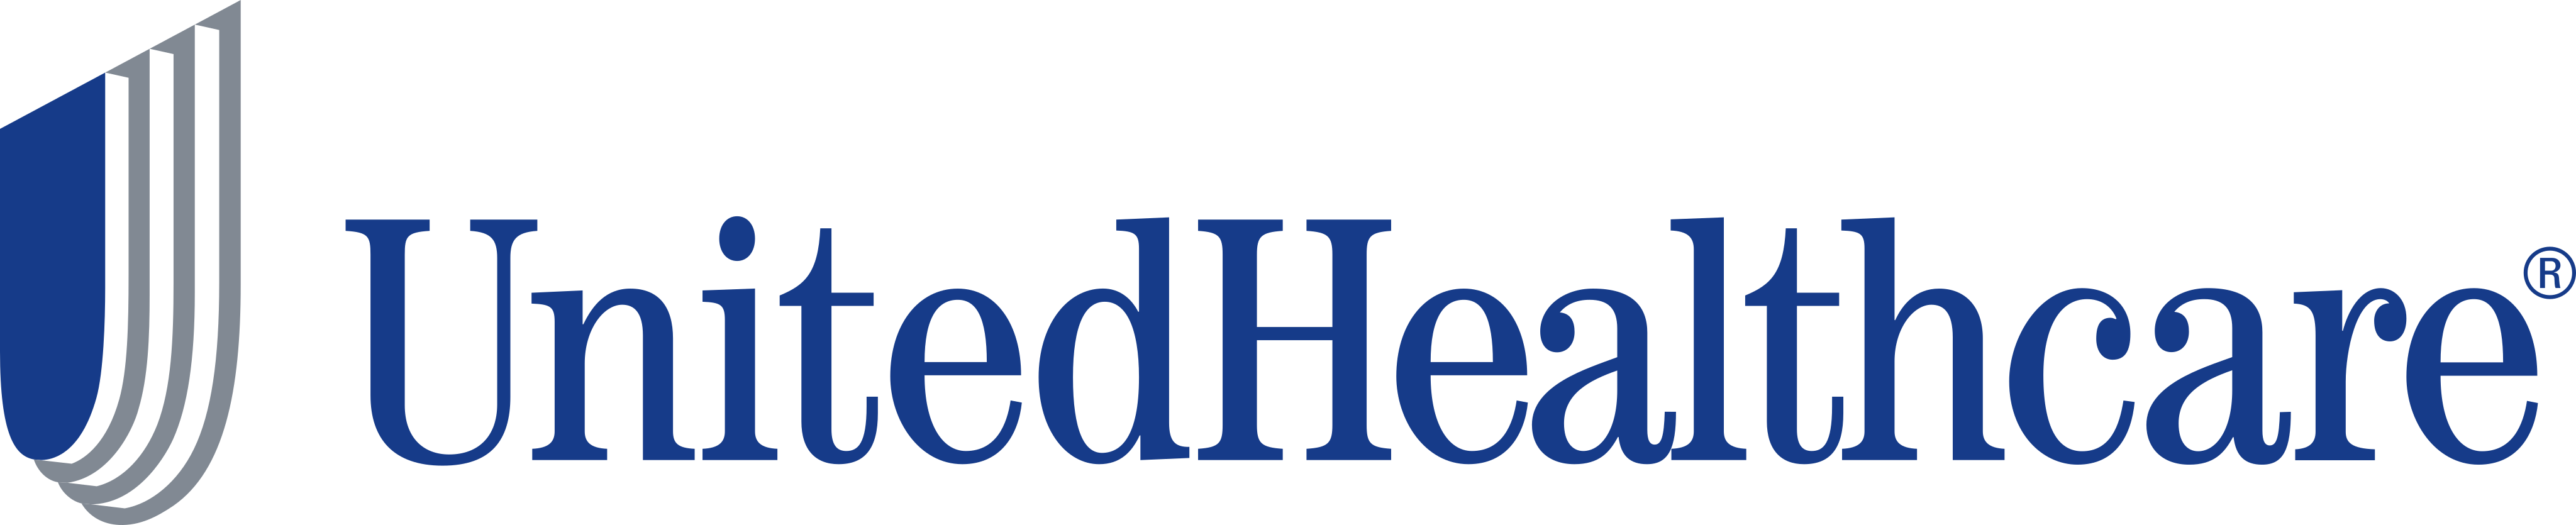 UnitedHealthcare Logo.